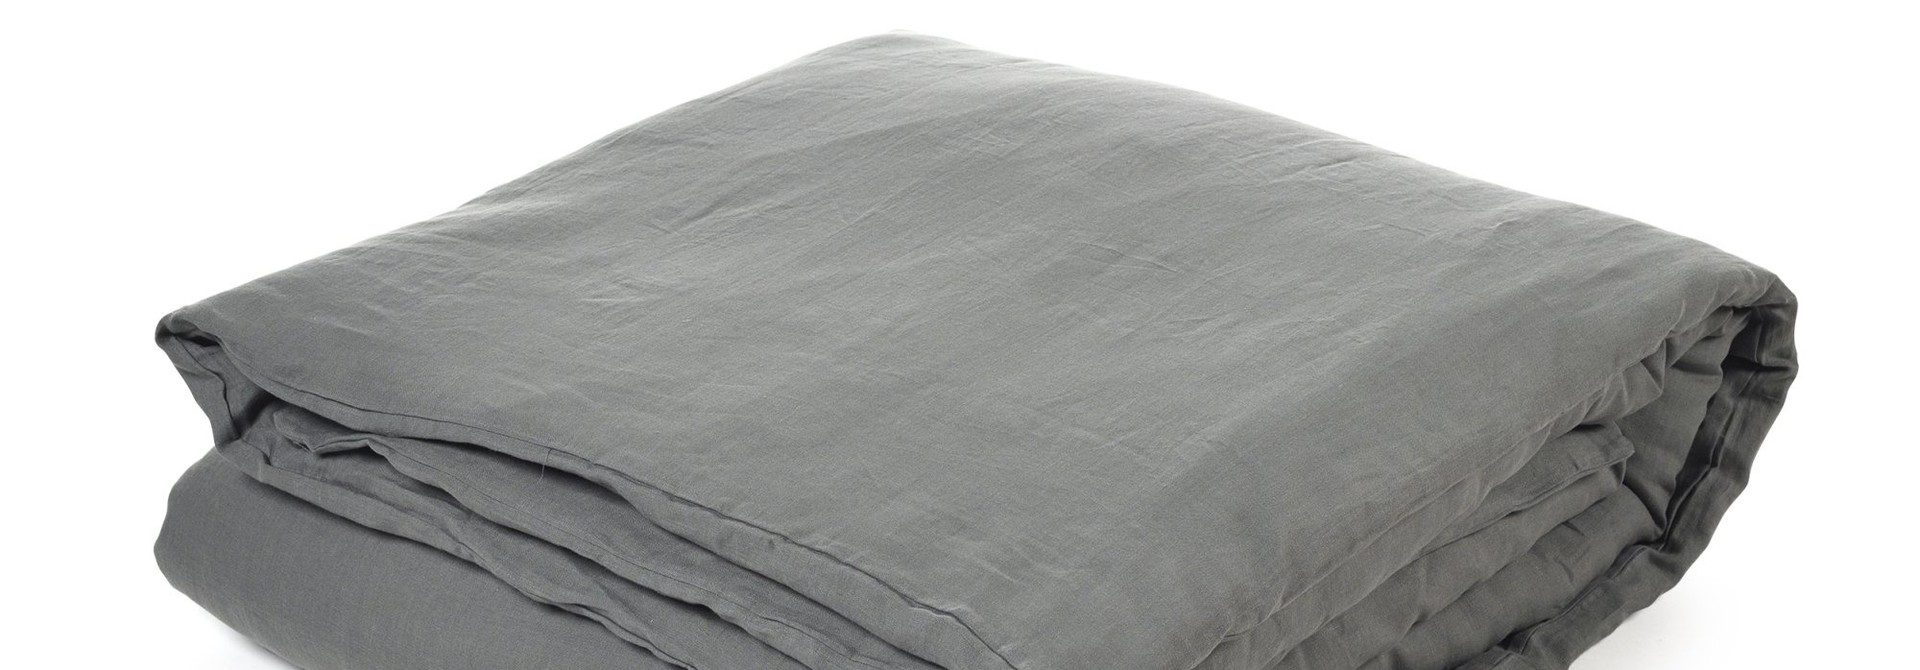 Duvet Cover - Santiago  - Dk Grey -  + Fitted Sheet - King